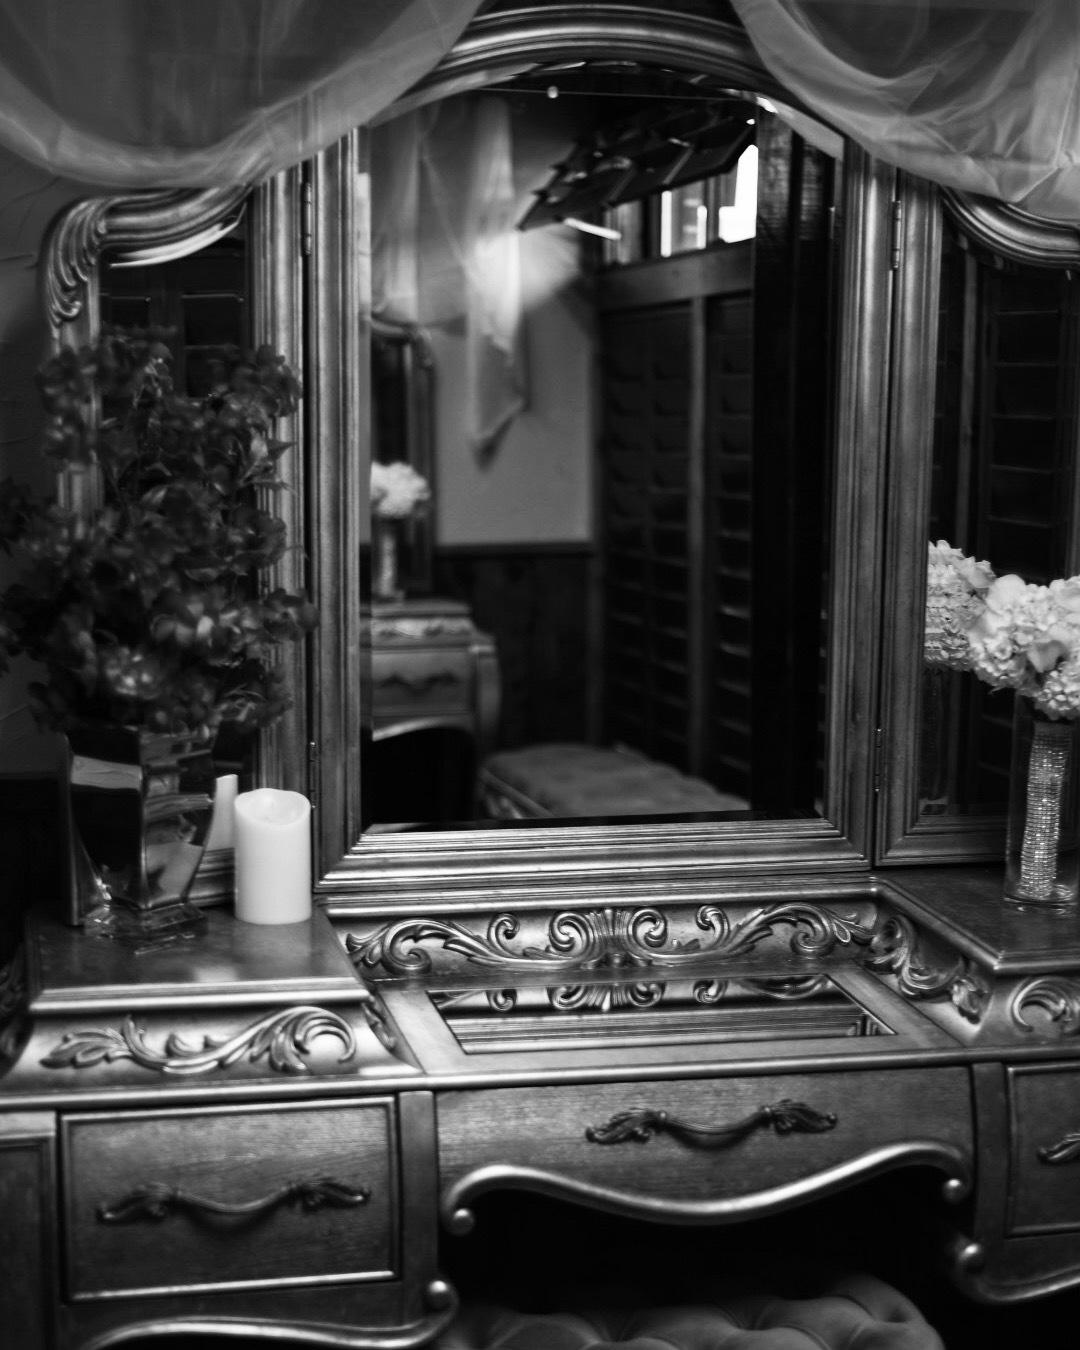 Dressing Room At A Wedding Venue  by Nicolas Restrepo